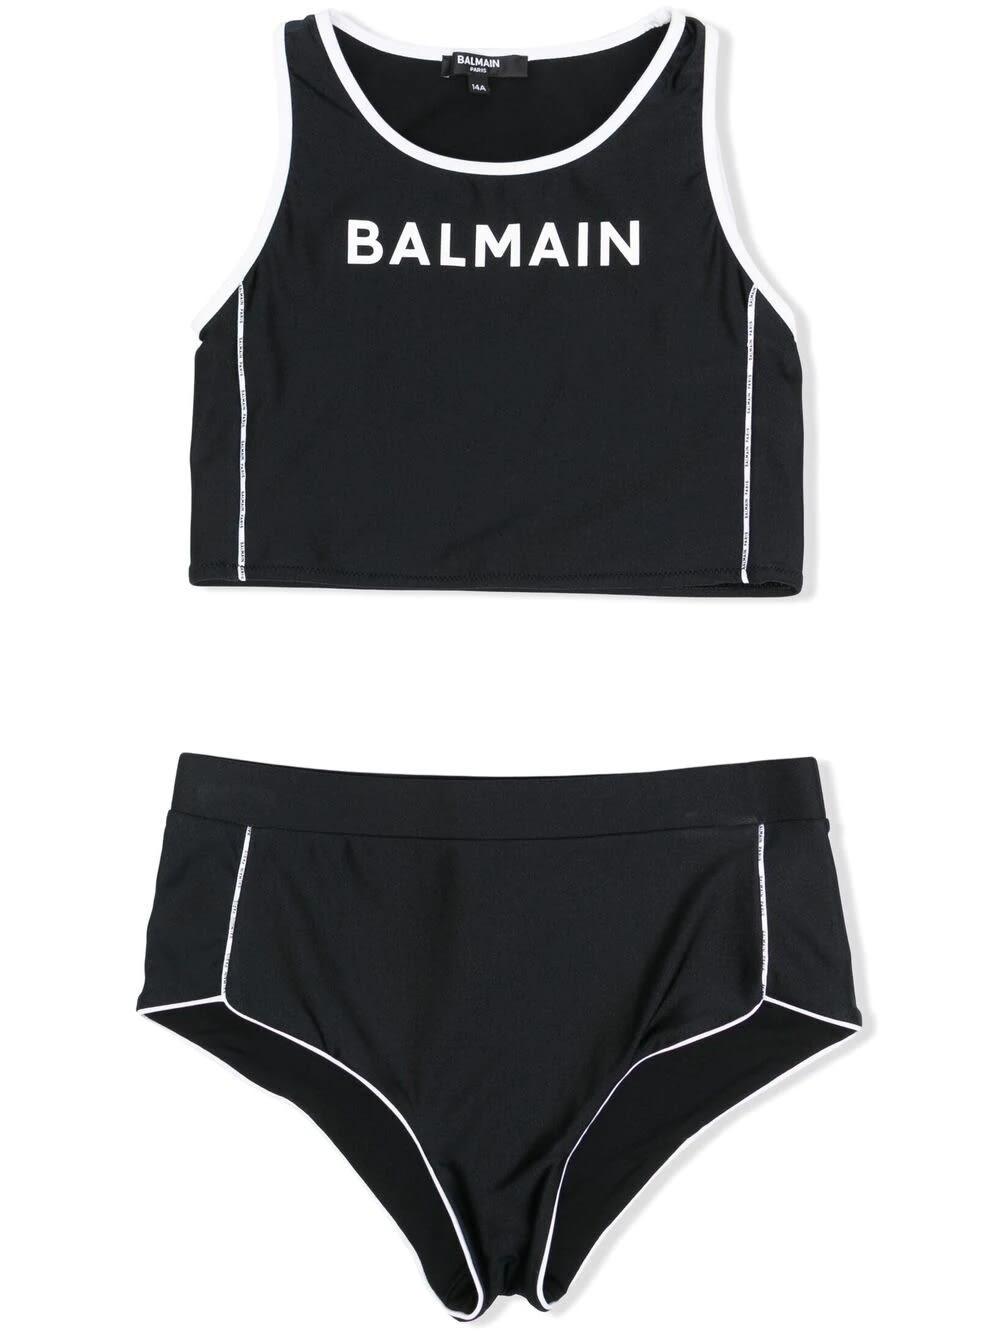 Balmain Two Piece Swimsuit